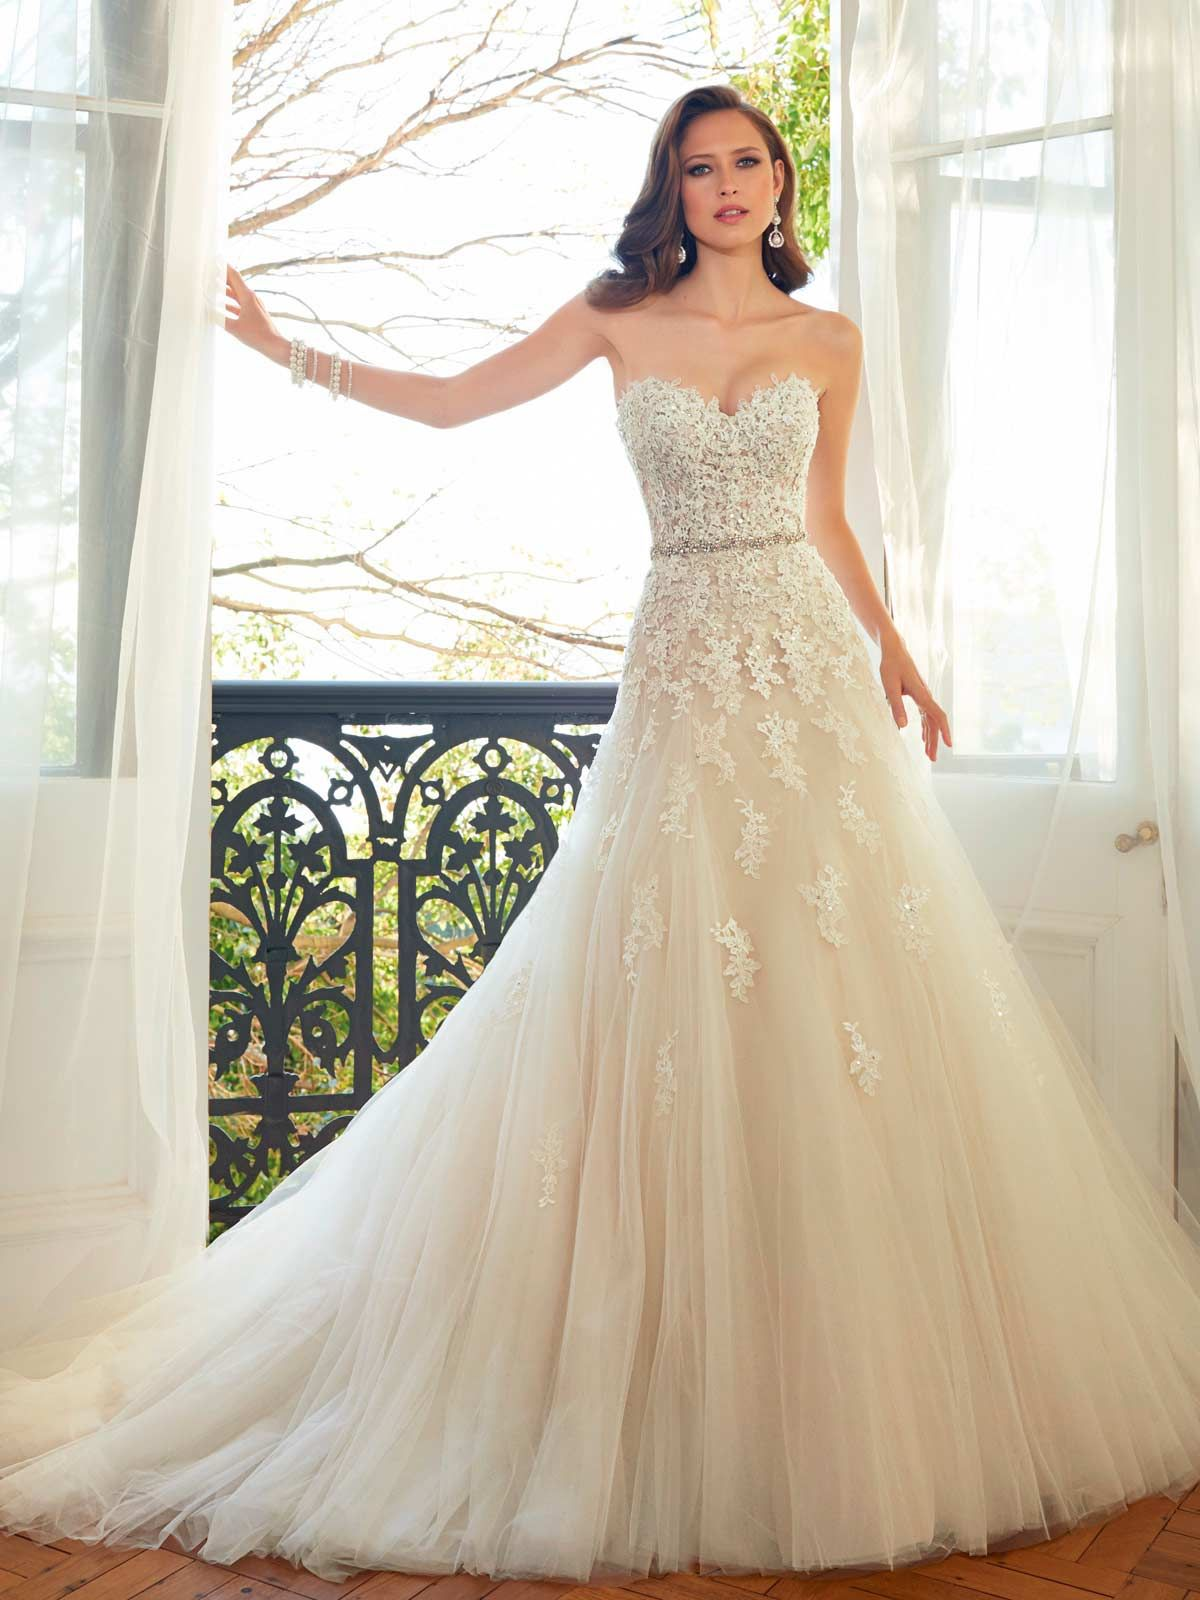 Sophia Tolli Spring 2015 Wedding Gowns   Pinterest   Gowns, Wedding ...